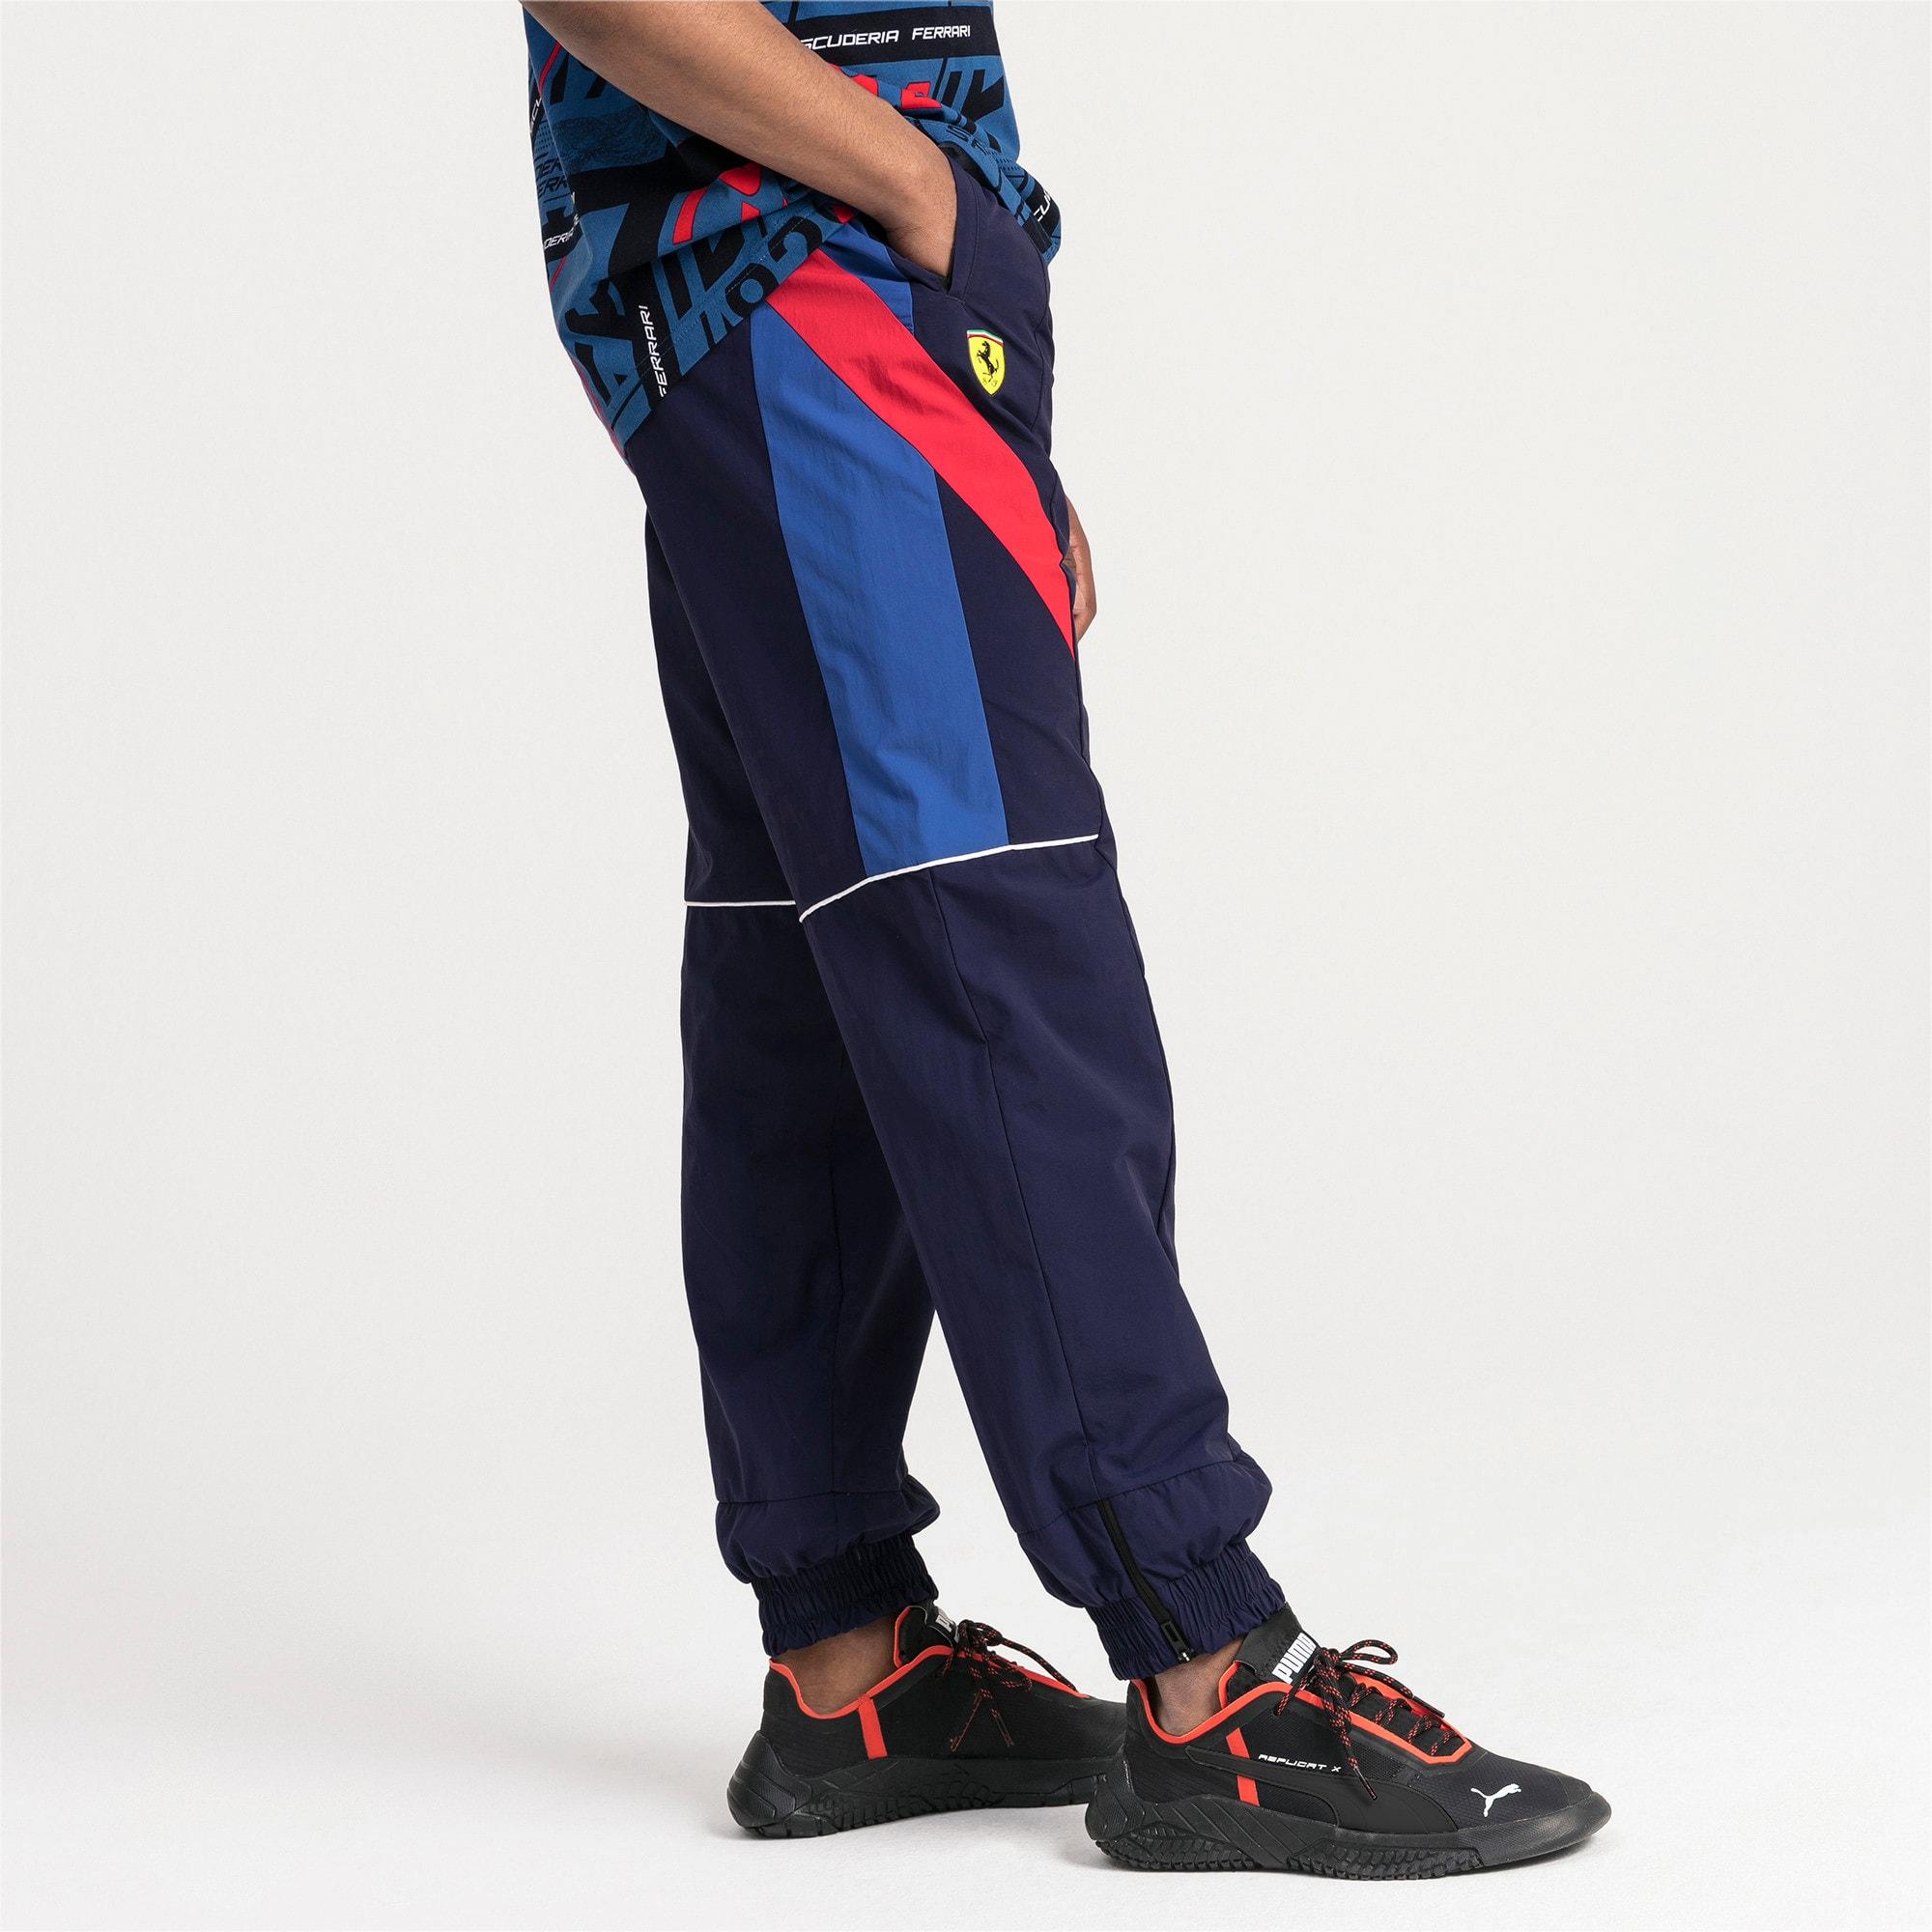 Thumbnail 1 of Ferrari Street Woven Men's Pants, Galaxy Blue, medium